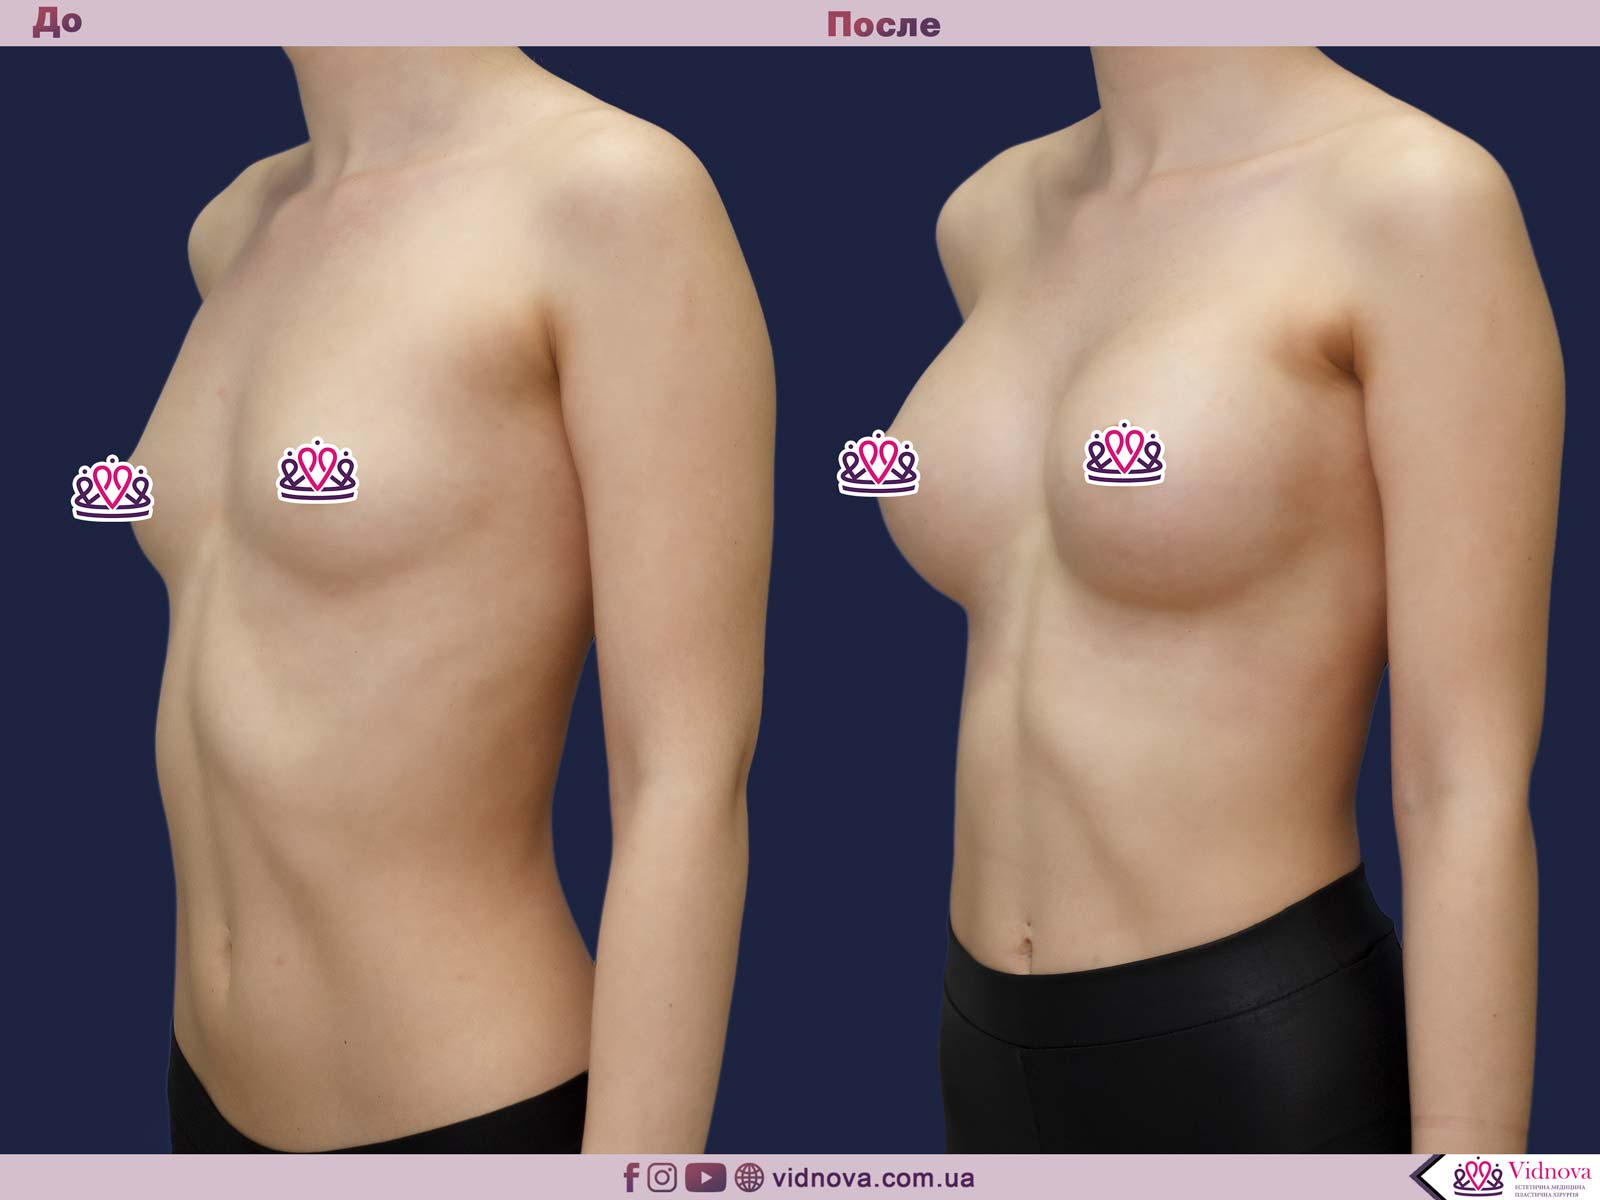 Увеличение груди: Фото ДО и ПОСЛЕ - Пример №72-2 - Клиника Vidnova